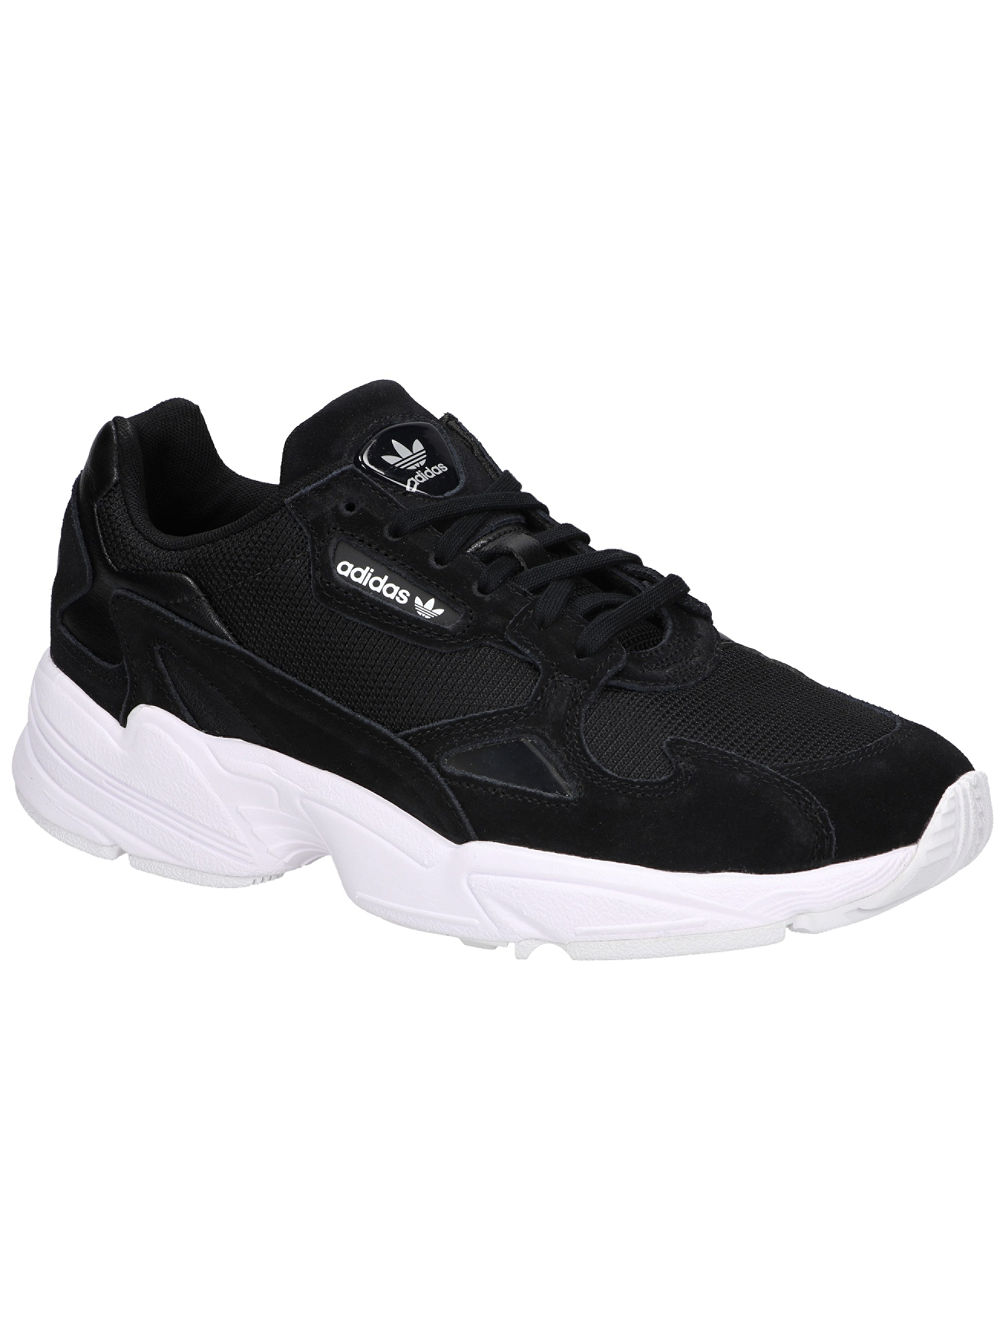 Buy adidas Originals Falcon Sneakers online at blue-tomato.com d8c3cfb48